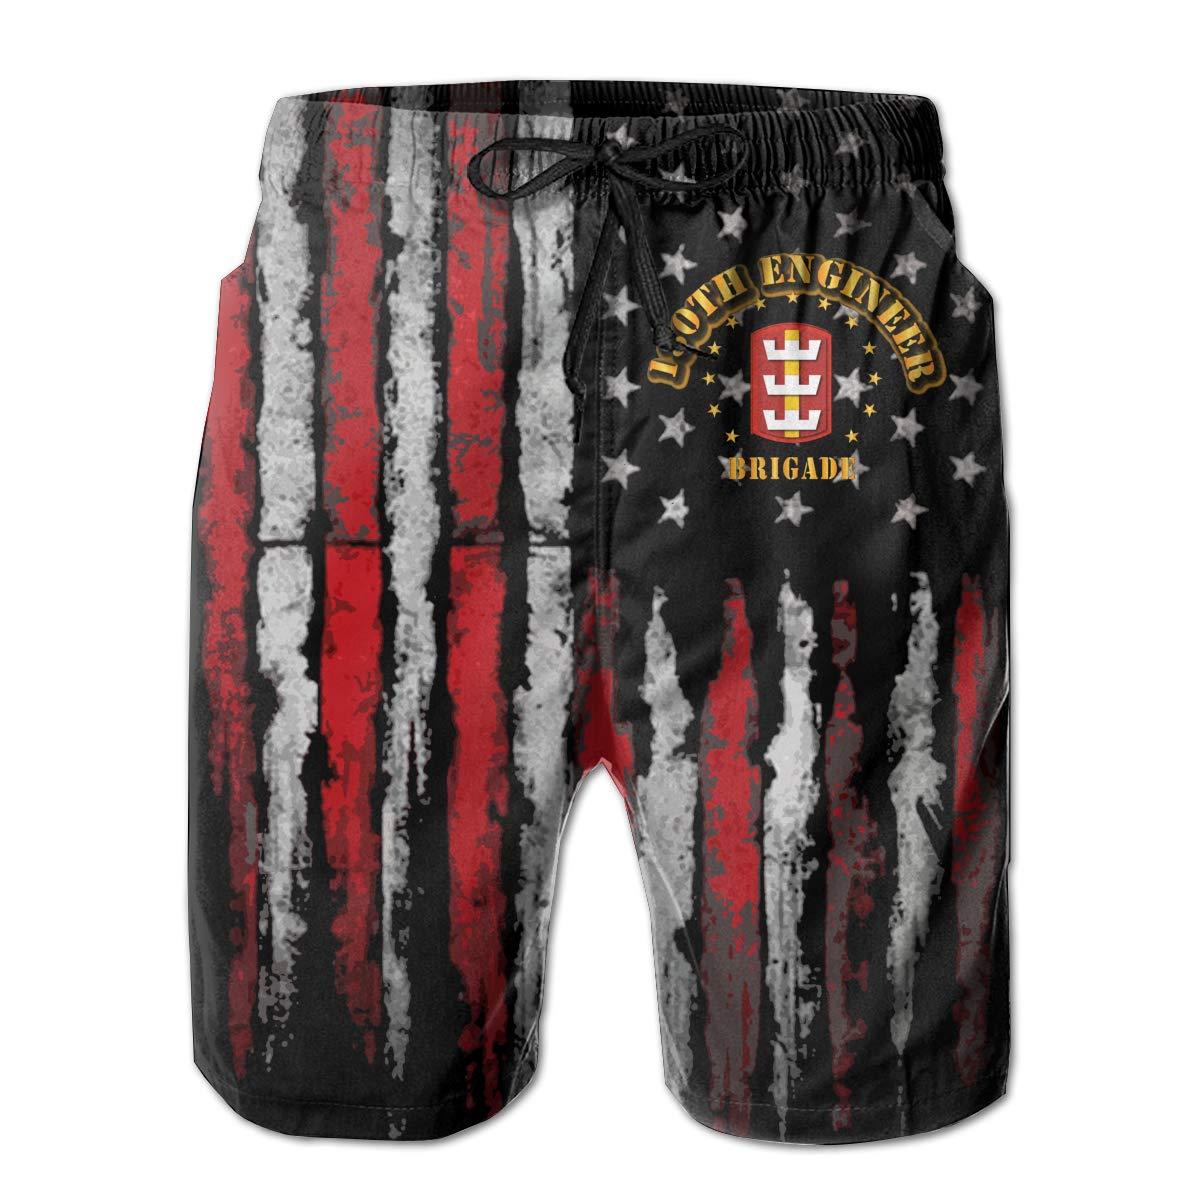 SSANSKKE 130th Engineer Brigade Mens Quick Dry Swim Trunks Beach Shorts